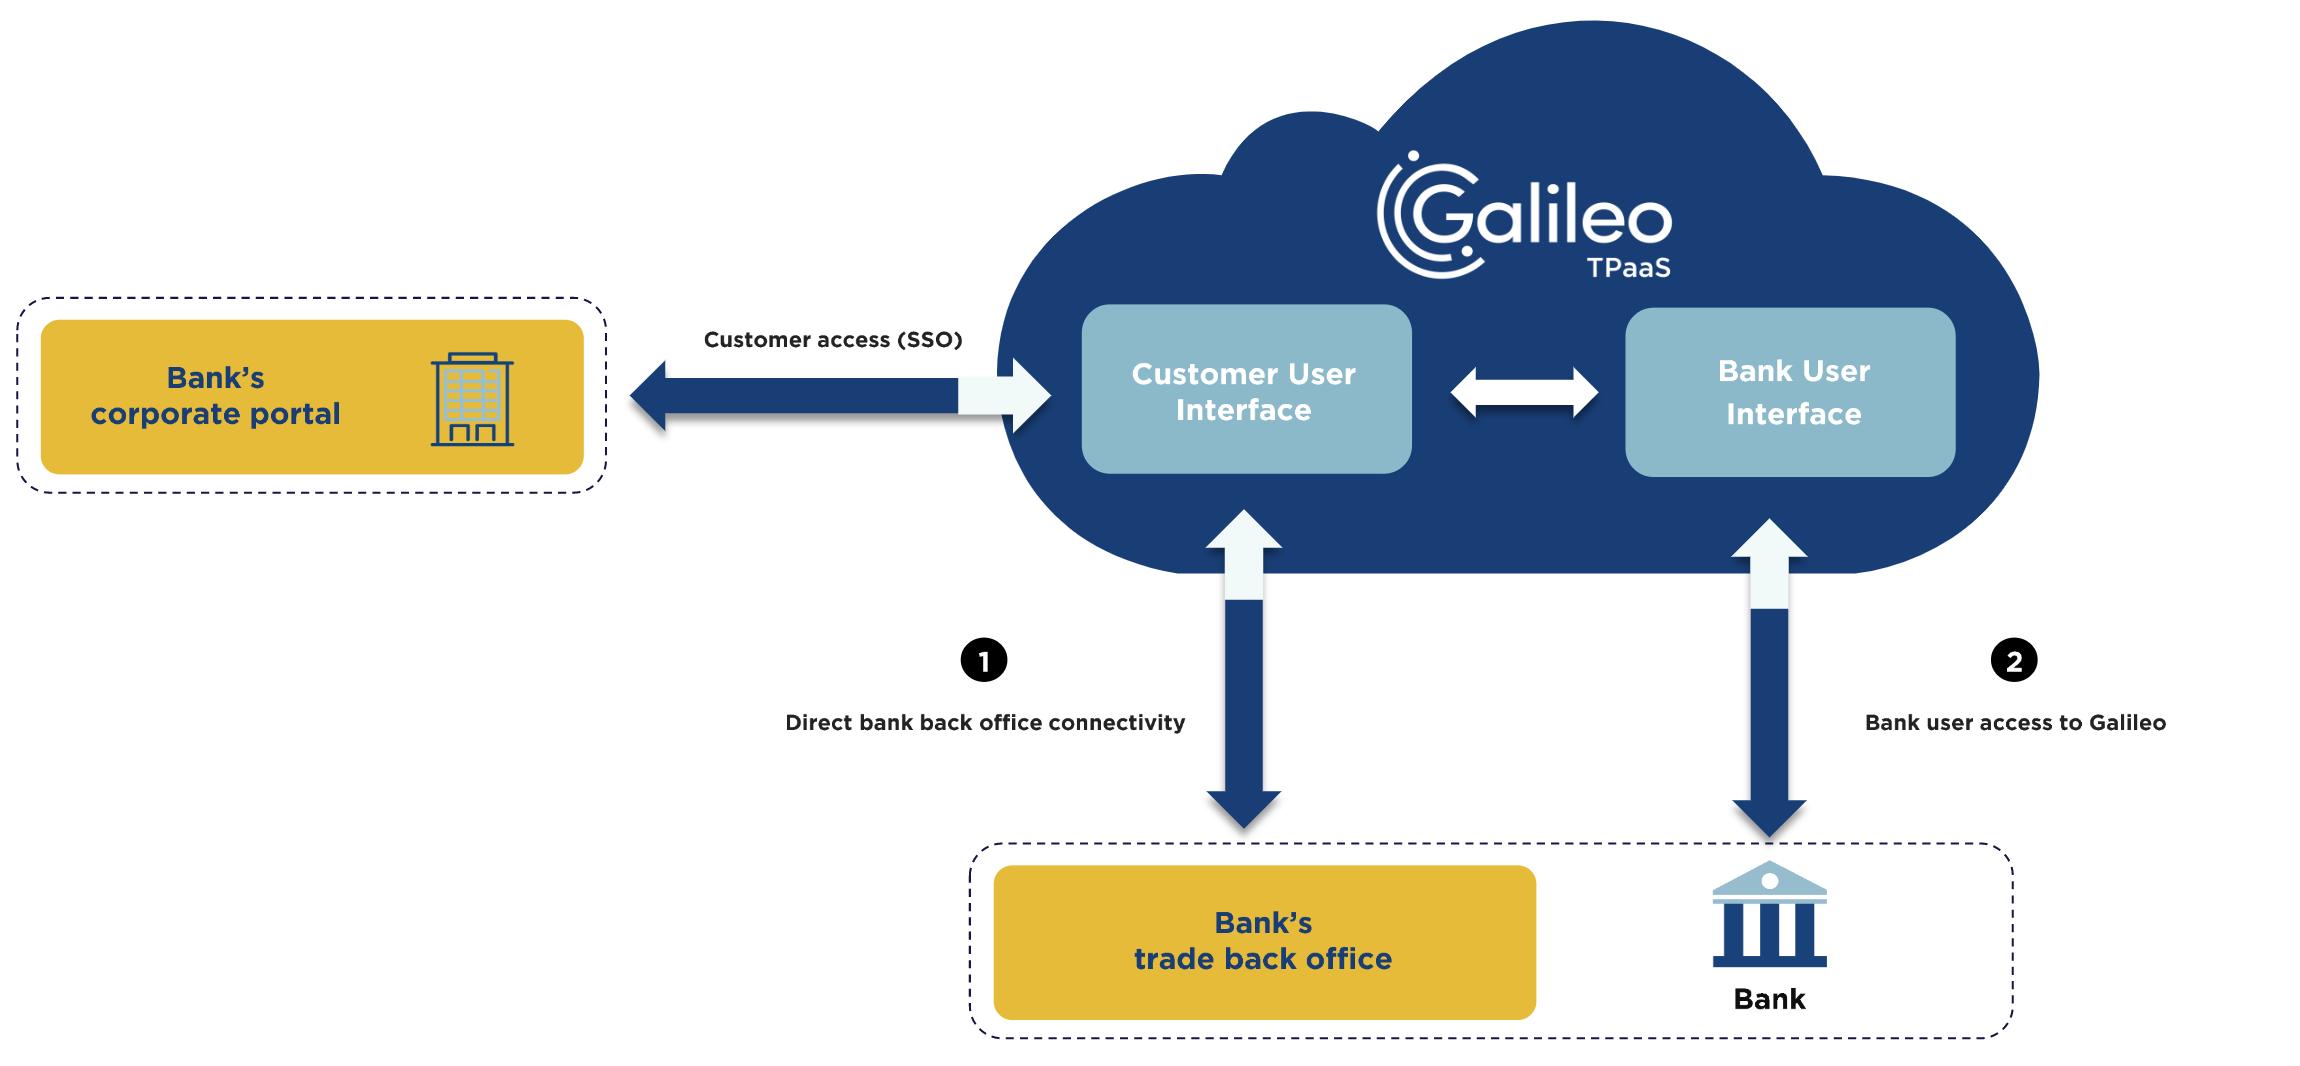 galileo-tpaas-quick-start-setup